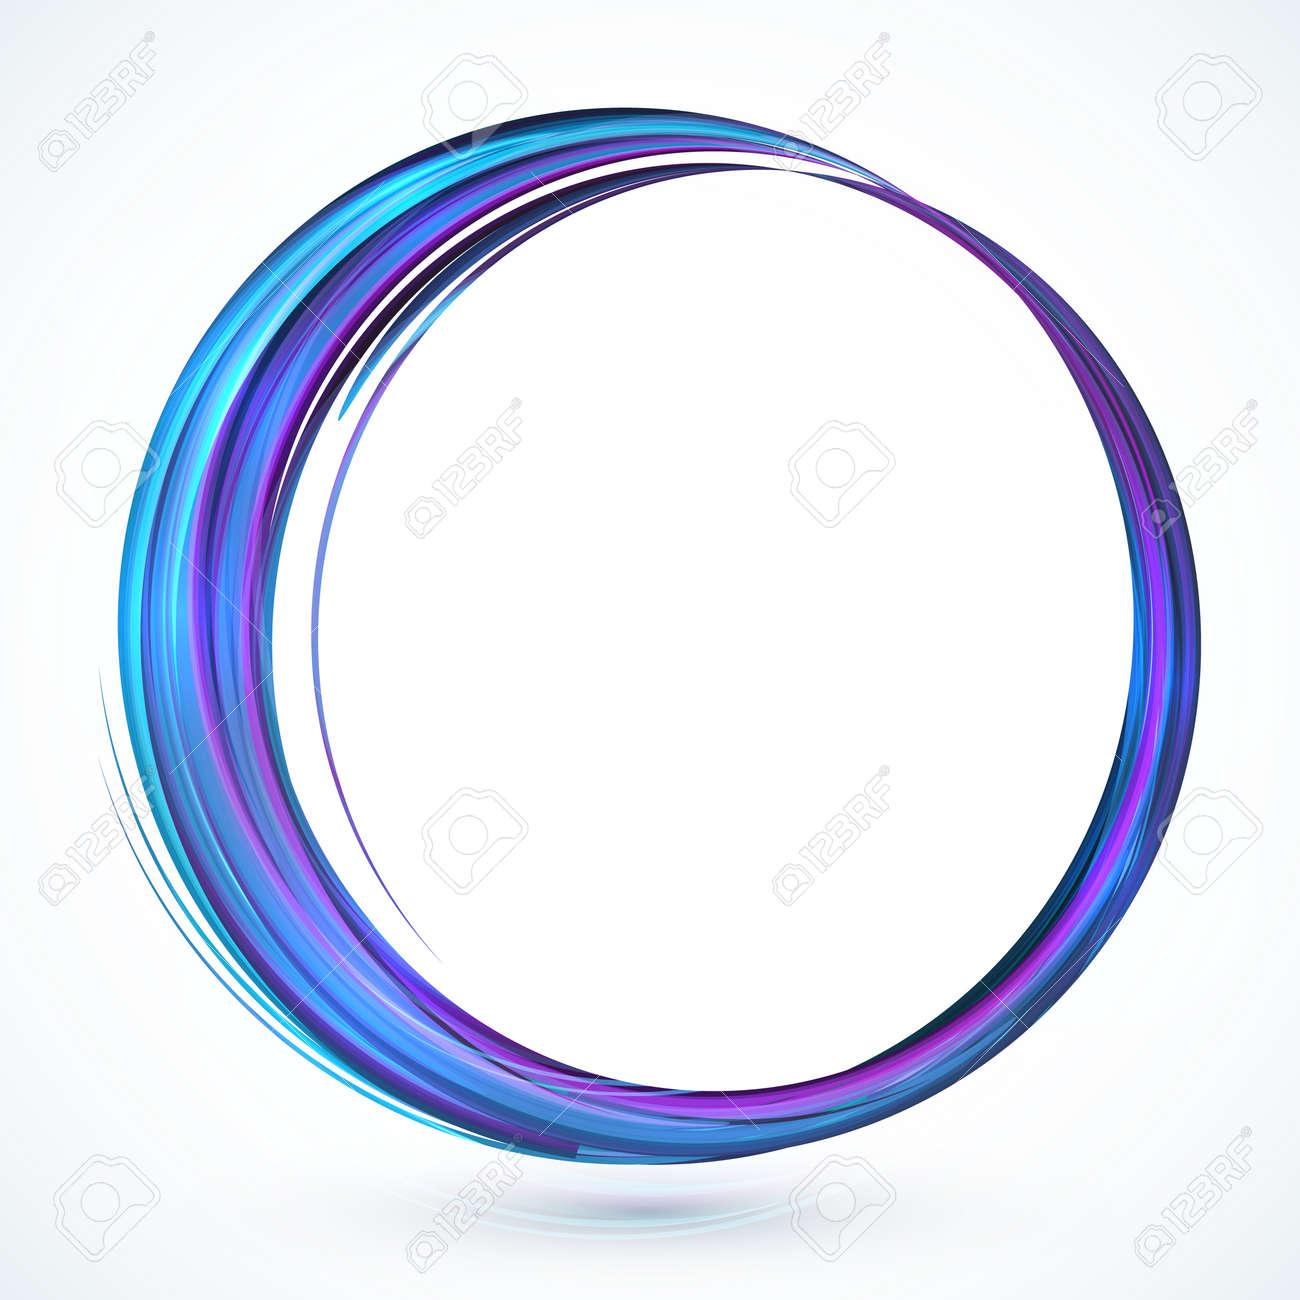 Blue Shining Abstract Vector Circle Frame Royalty Free Cliparts ...